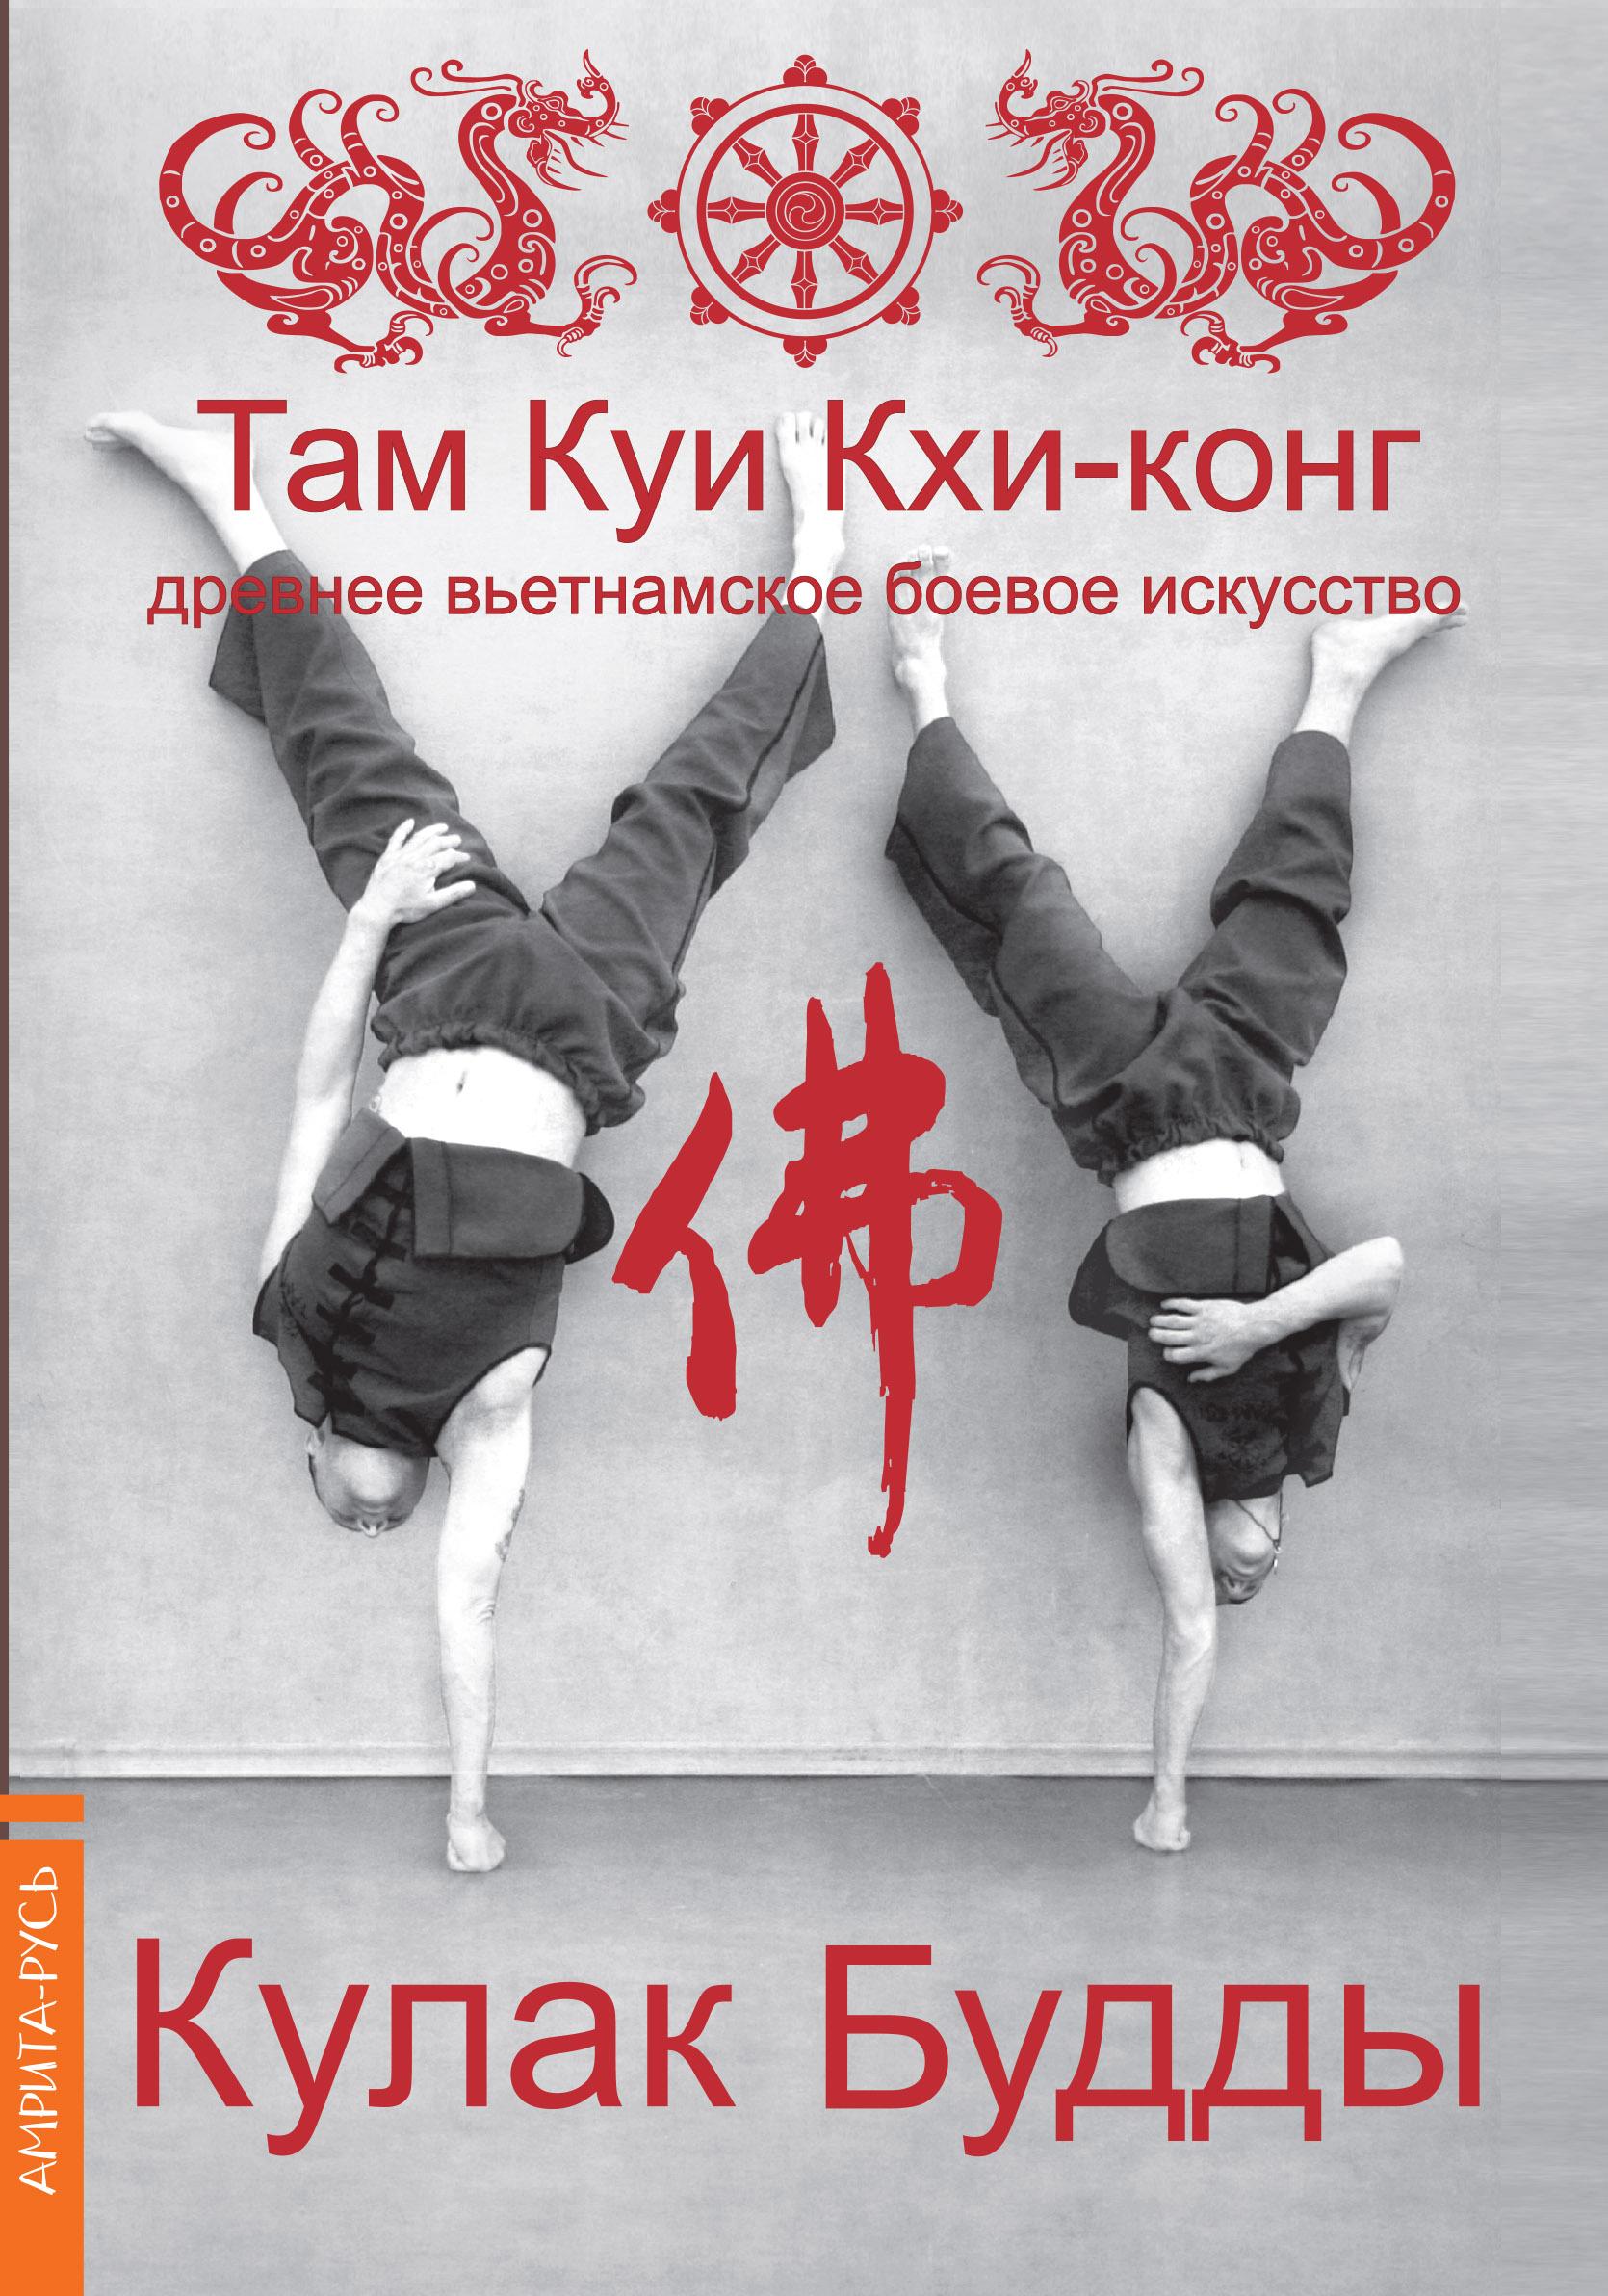 Кулак Будды. 3-е изд. Древнее вьетнамское боевое искусство Там Куи Кхи-конг